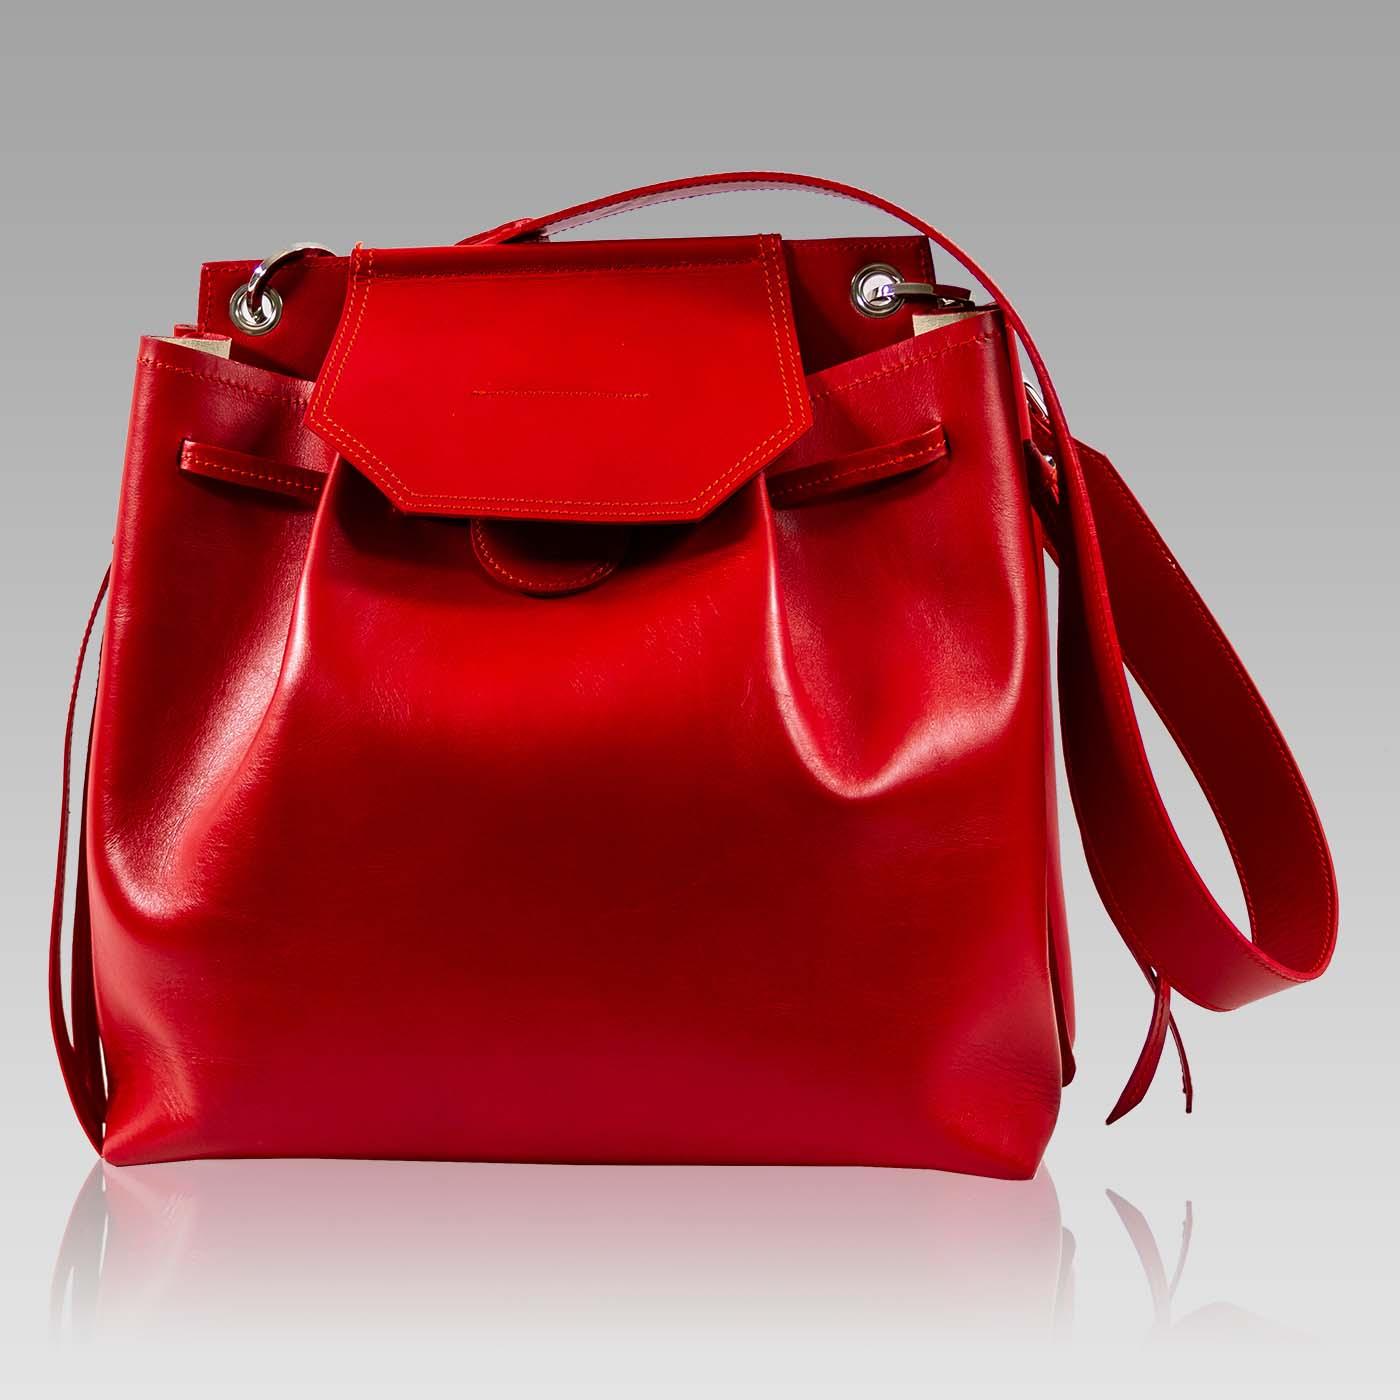 Valentino Orlandi Purse Scarlet Red Leather Drawstring Crossbody Bag